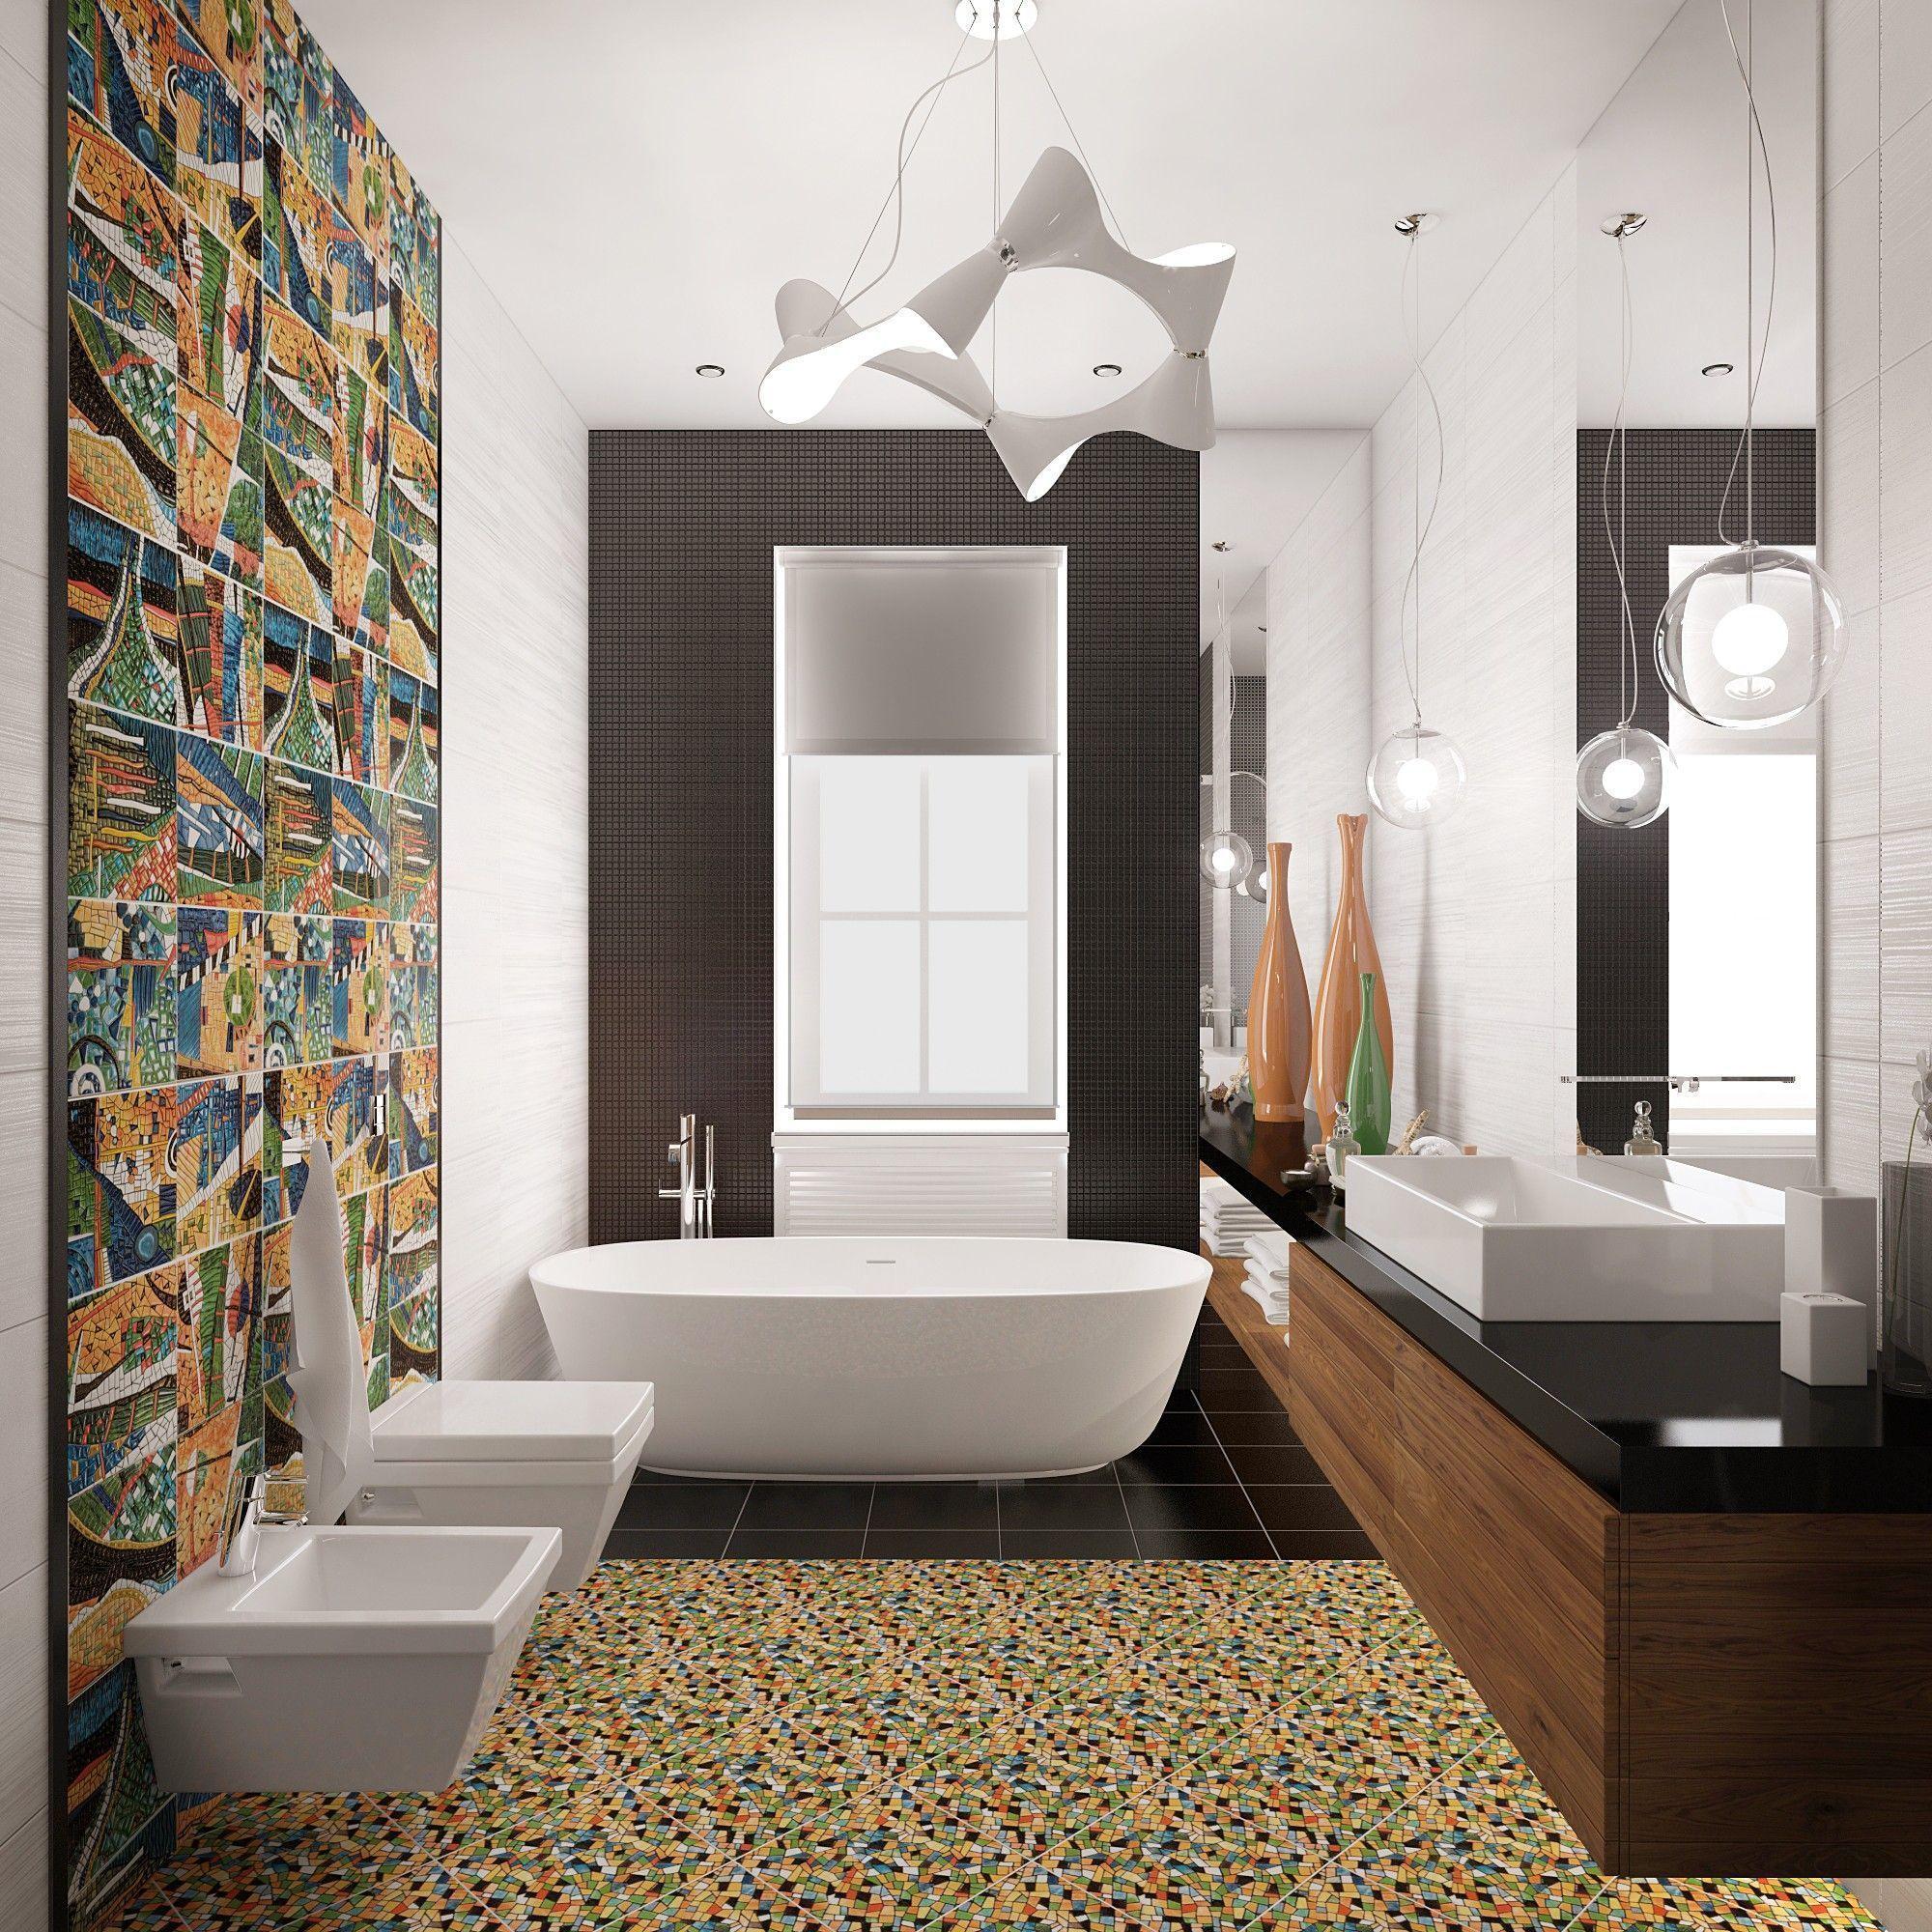 Санузел. Дизайн интерьера дома.